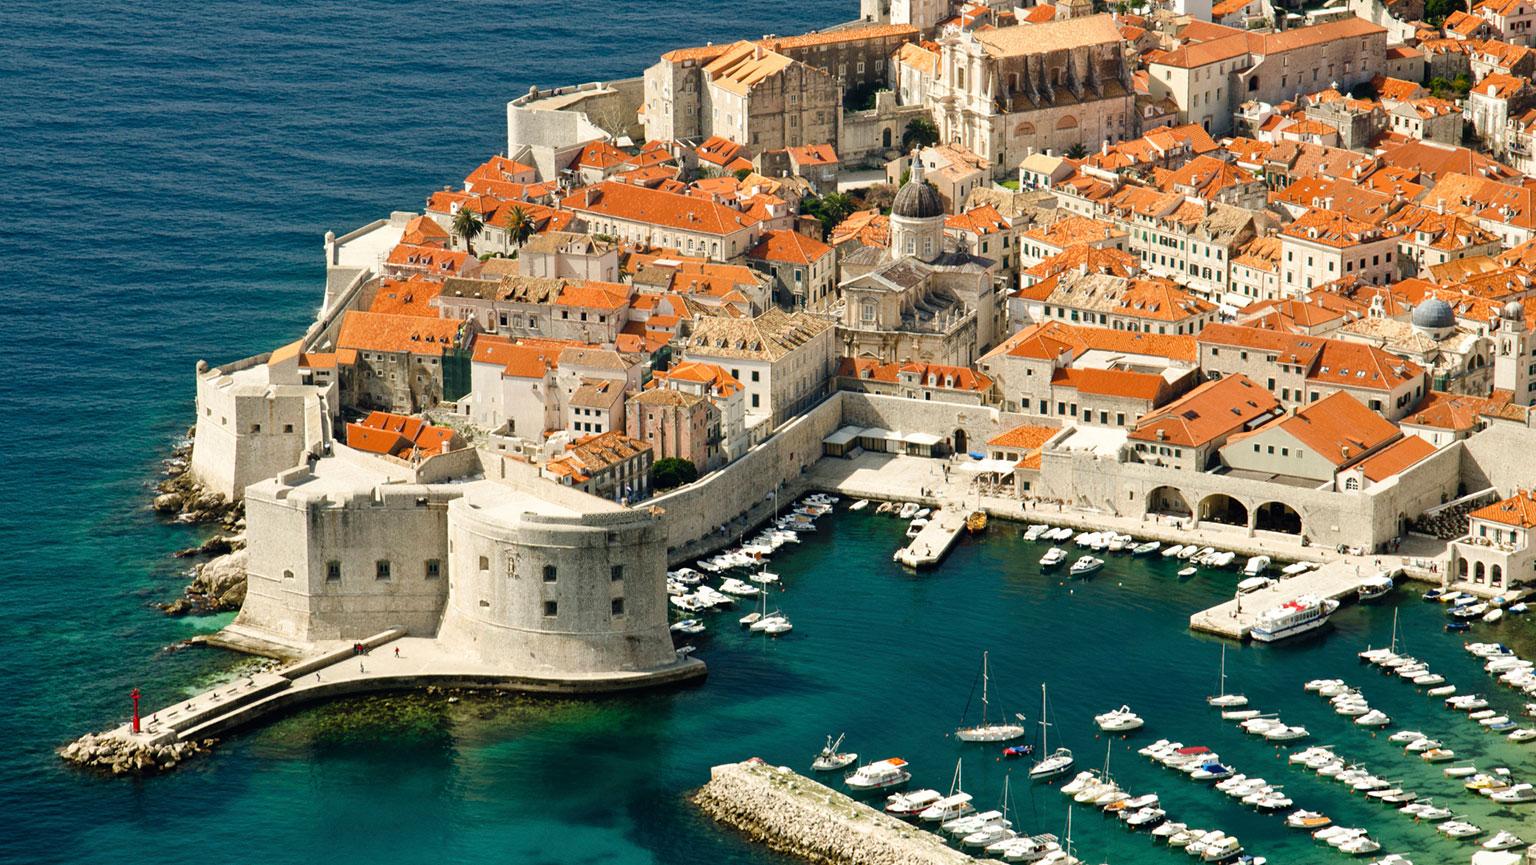 Dubrovnik—Pearl of the Adriatic